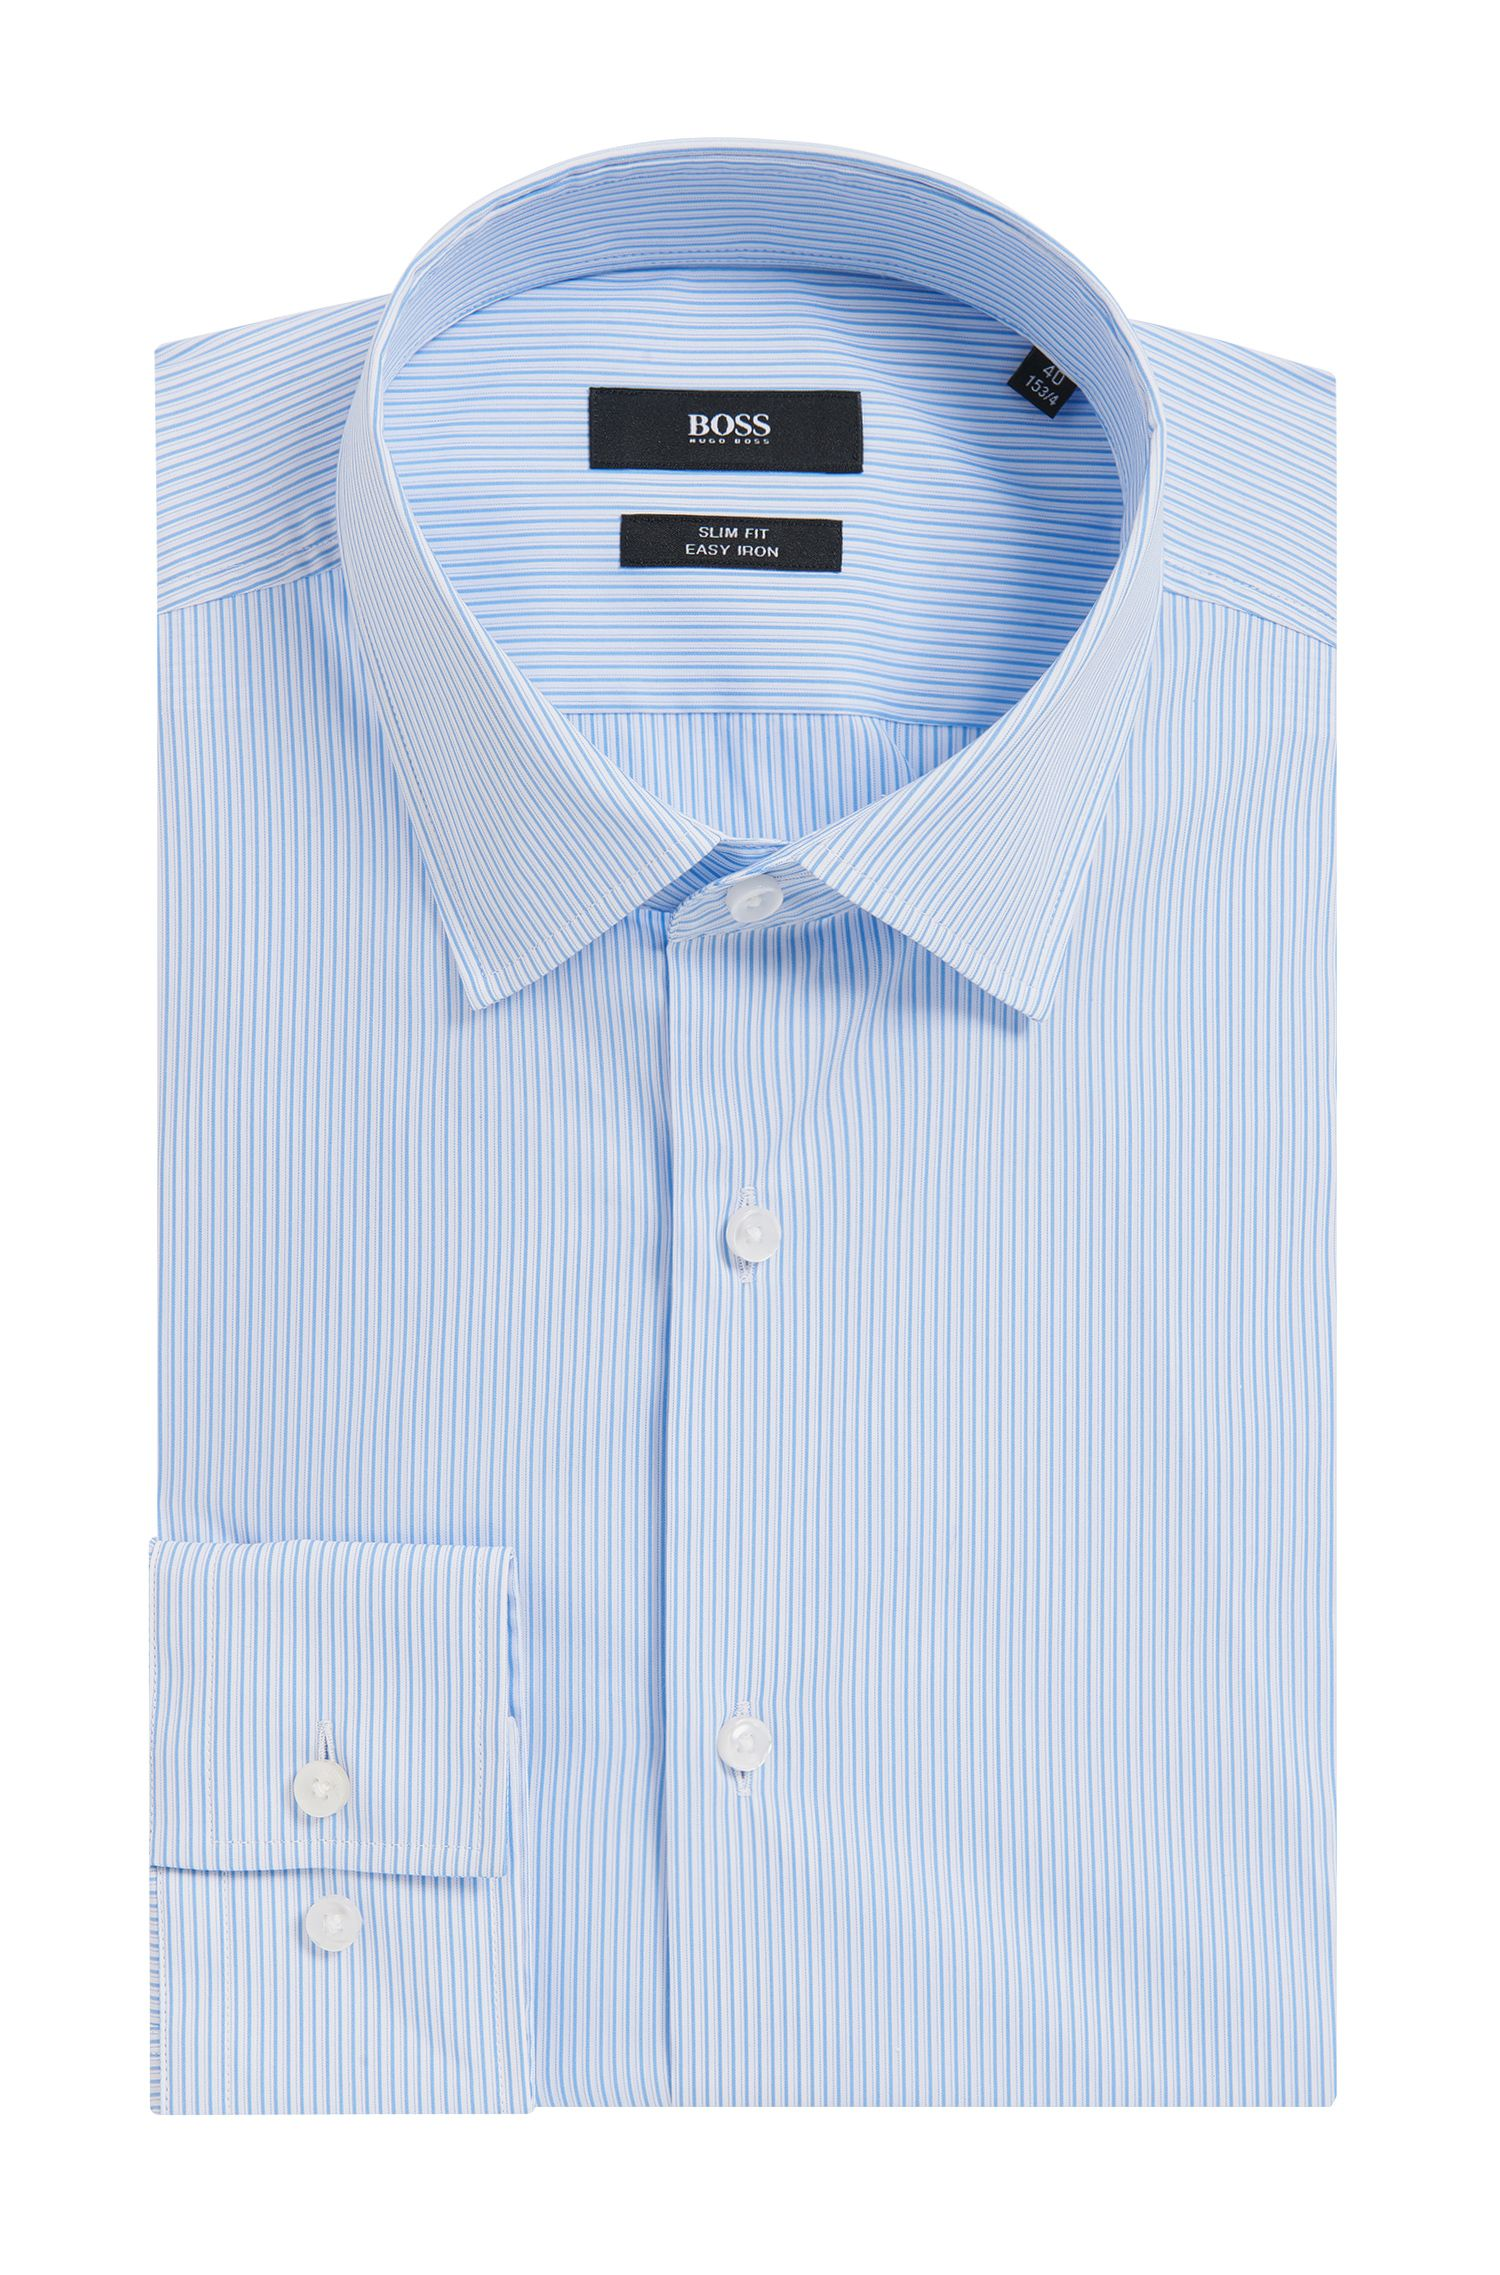 Pinstriped Stretch Cotton Dress Shirt, Slim Fit |  Jenno, Light Blue